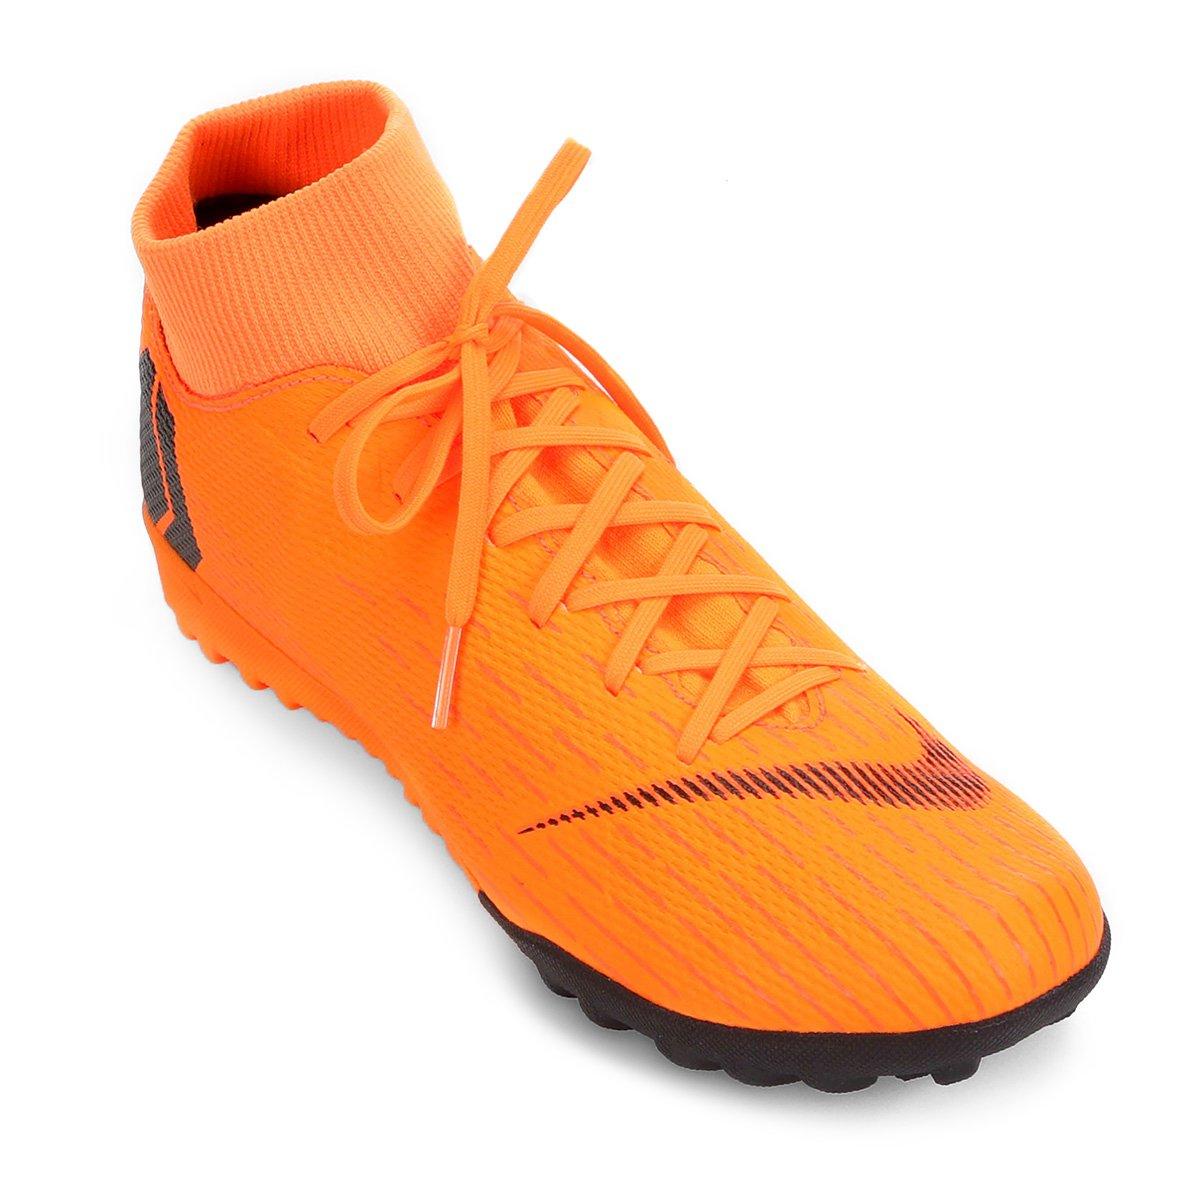 23e9ebb05103c Chuteira Society Nike Mercurial Superfly 6 Academy - Laranja e Preto -  Compre Agora